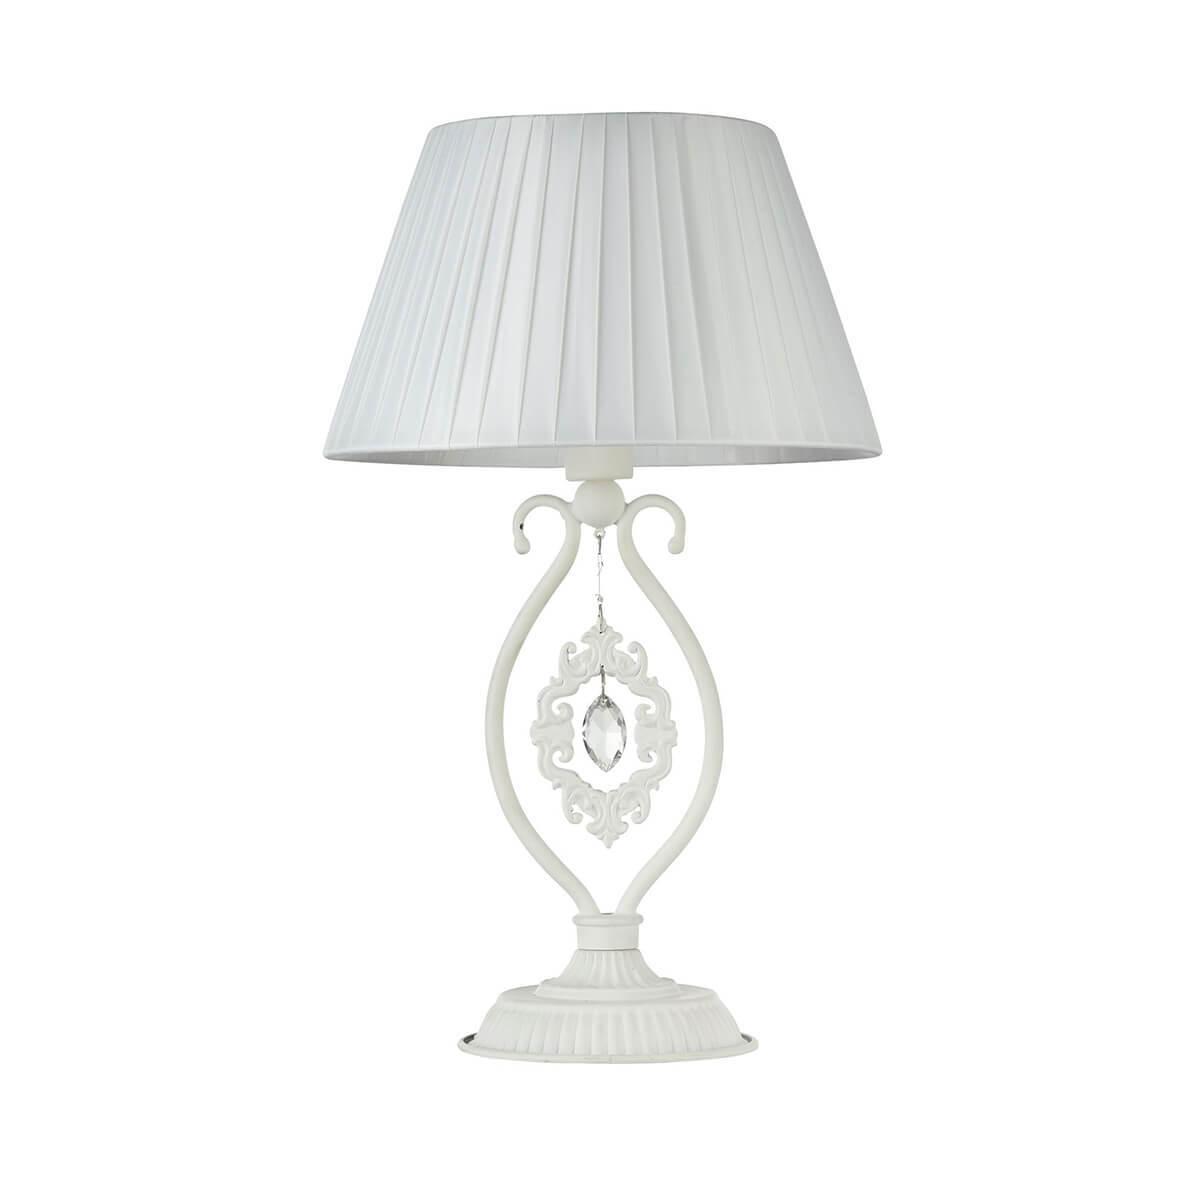 Настольная лампа Maytoni Passarinho ARM001-11-W цена